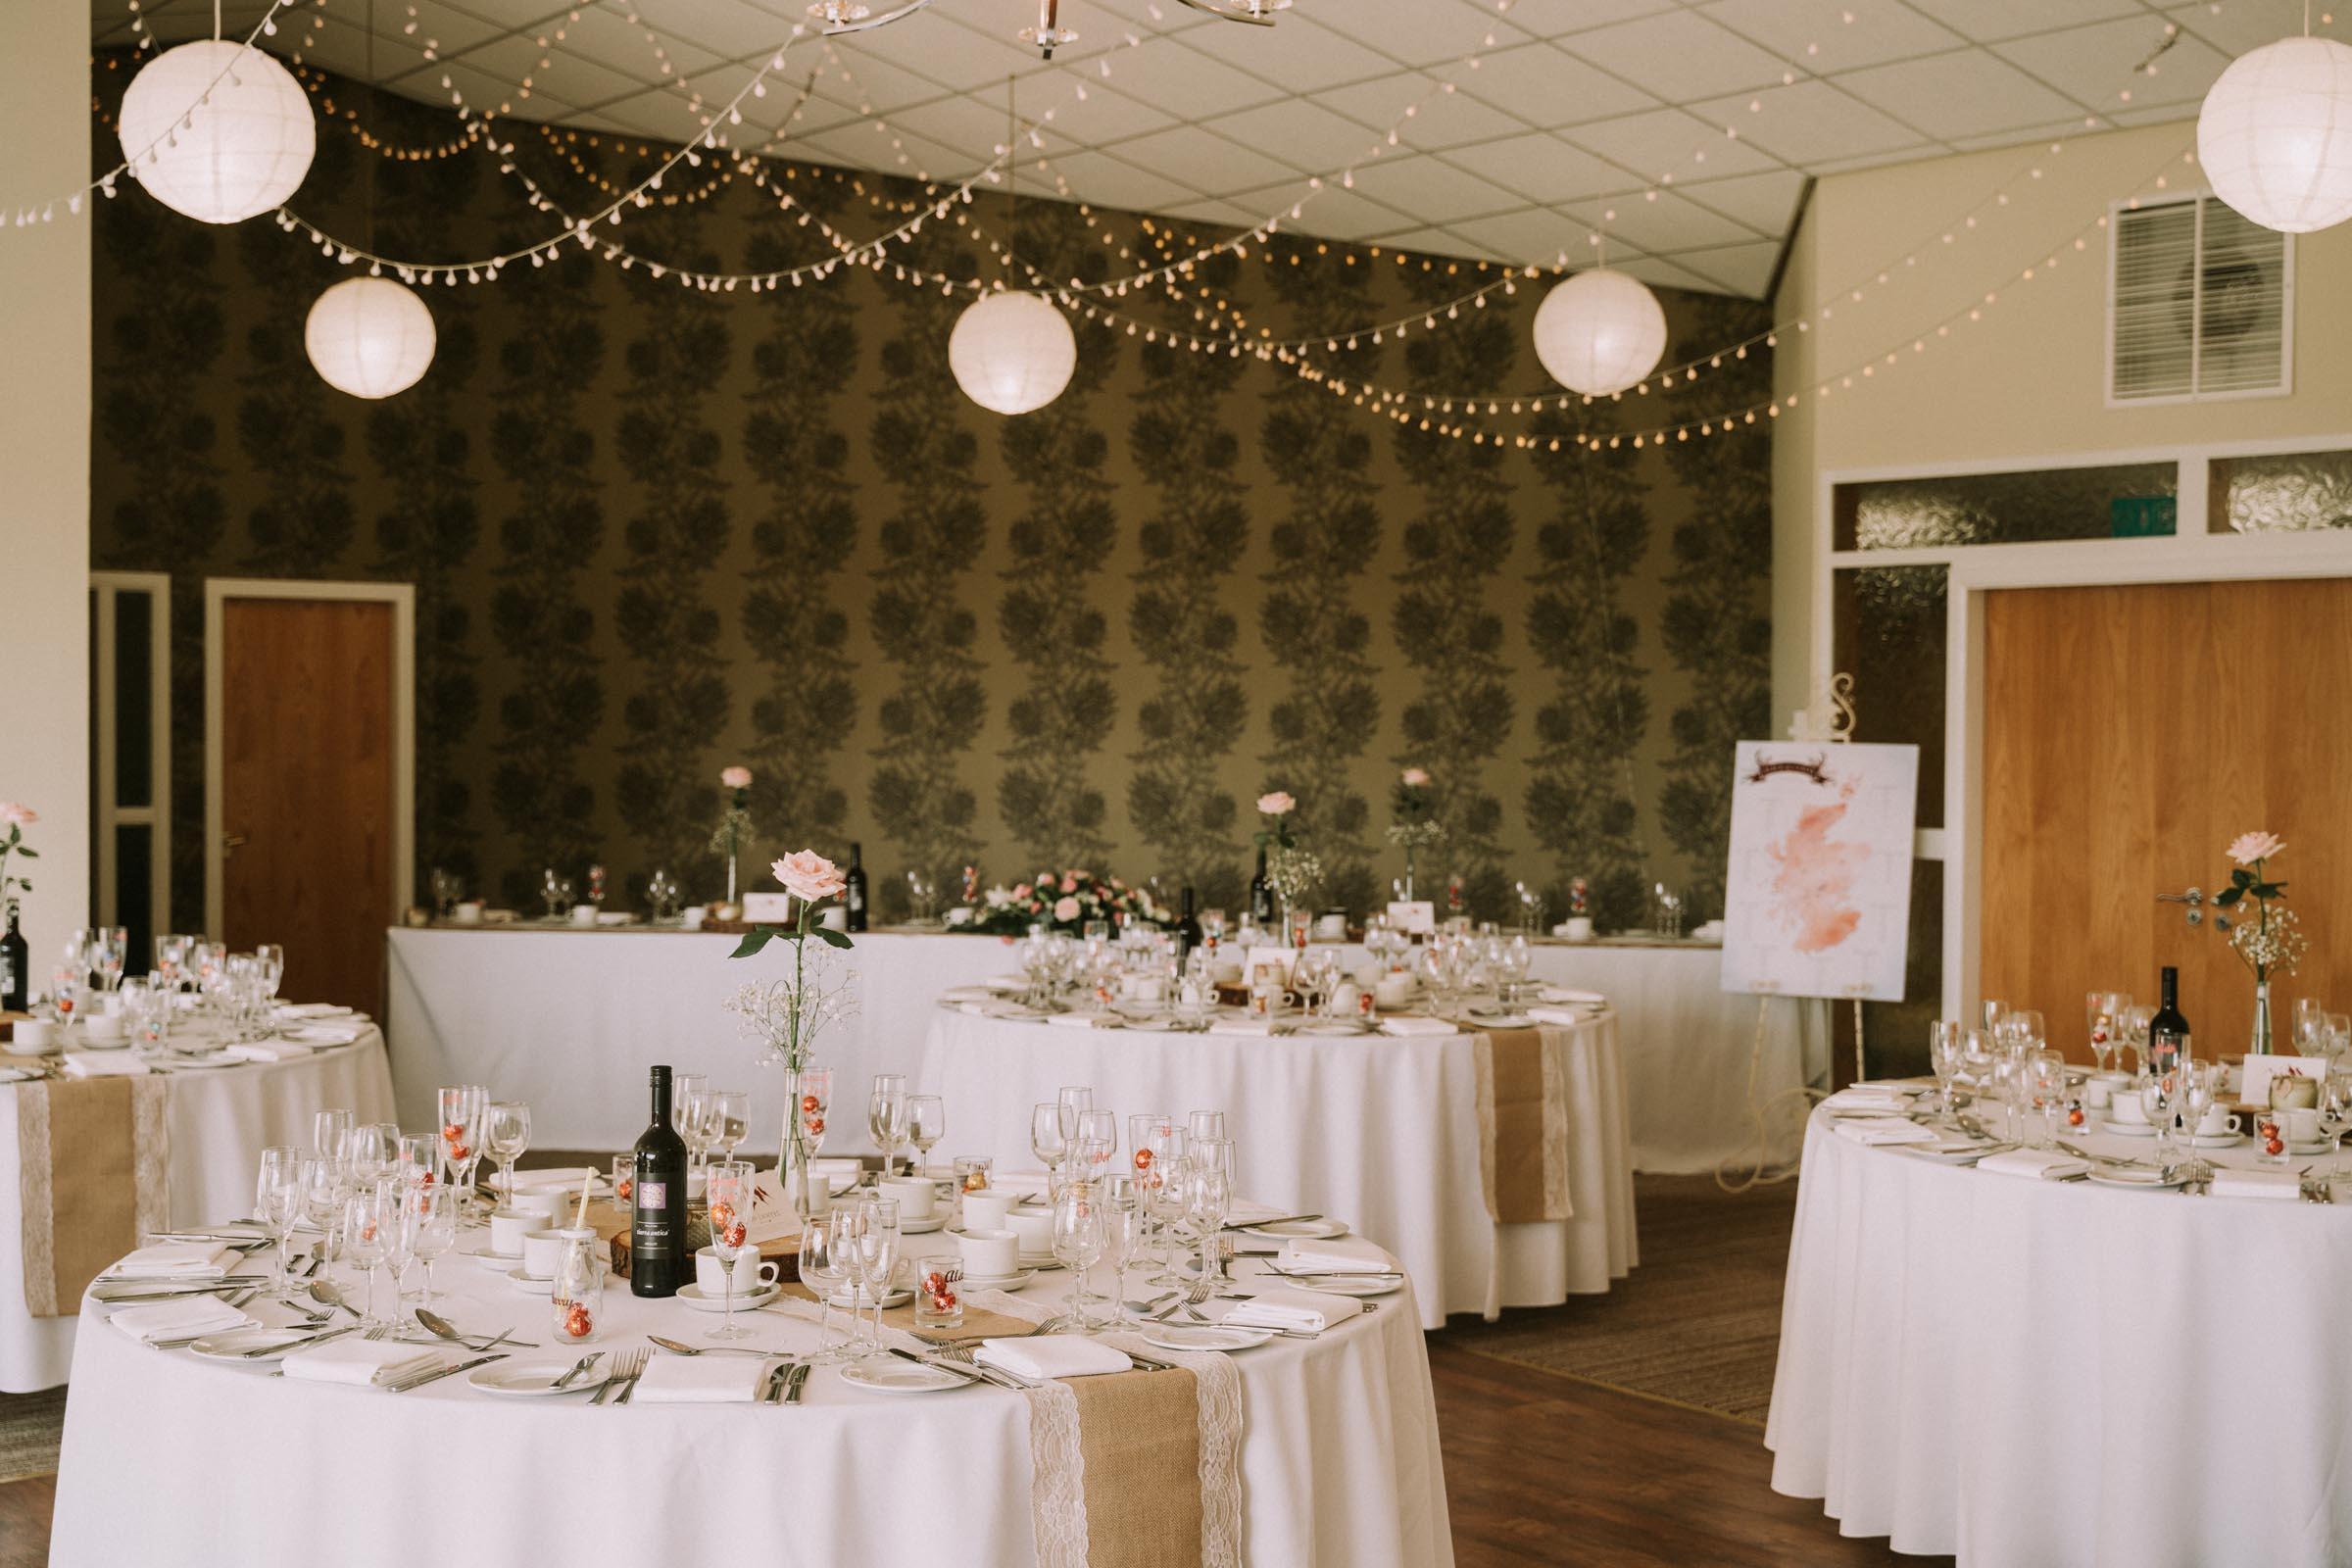 loch_lomond_waterfront_wedding_dearlyphotography (11 of 103).jpg